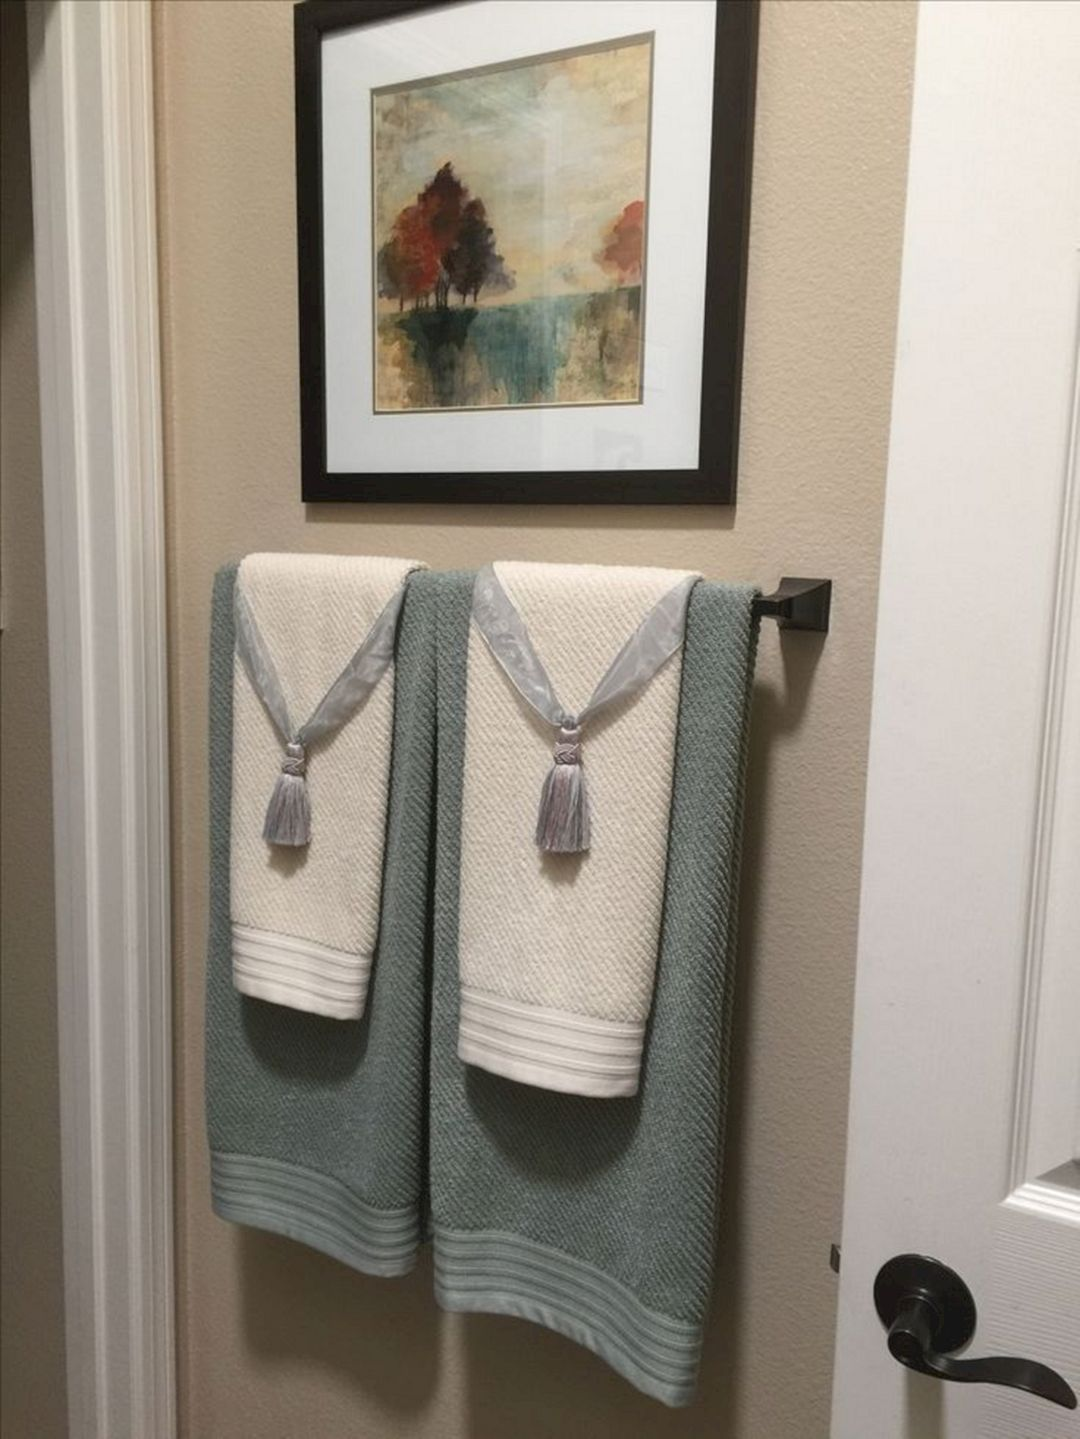 24 Most Popular Bathroom Design And Amazing Decor Ideas Bathroom Towel Decor Bathroom Towels Display Towel Display